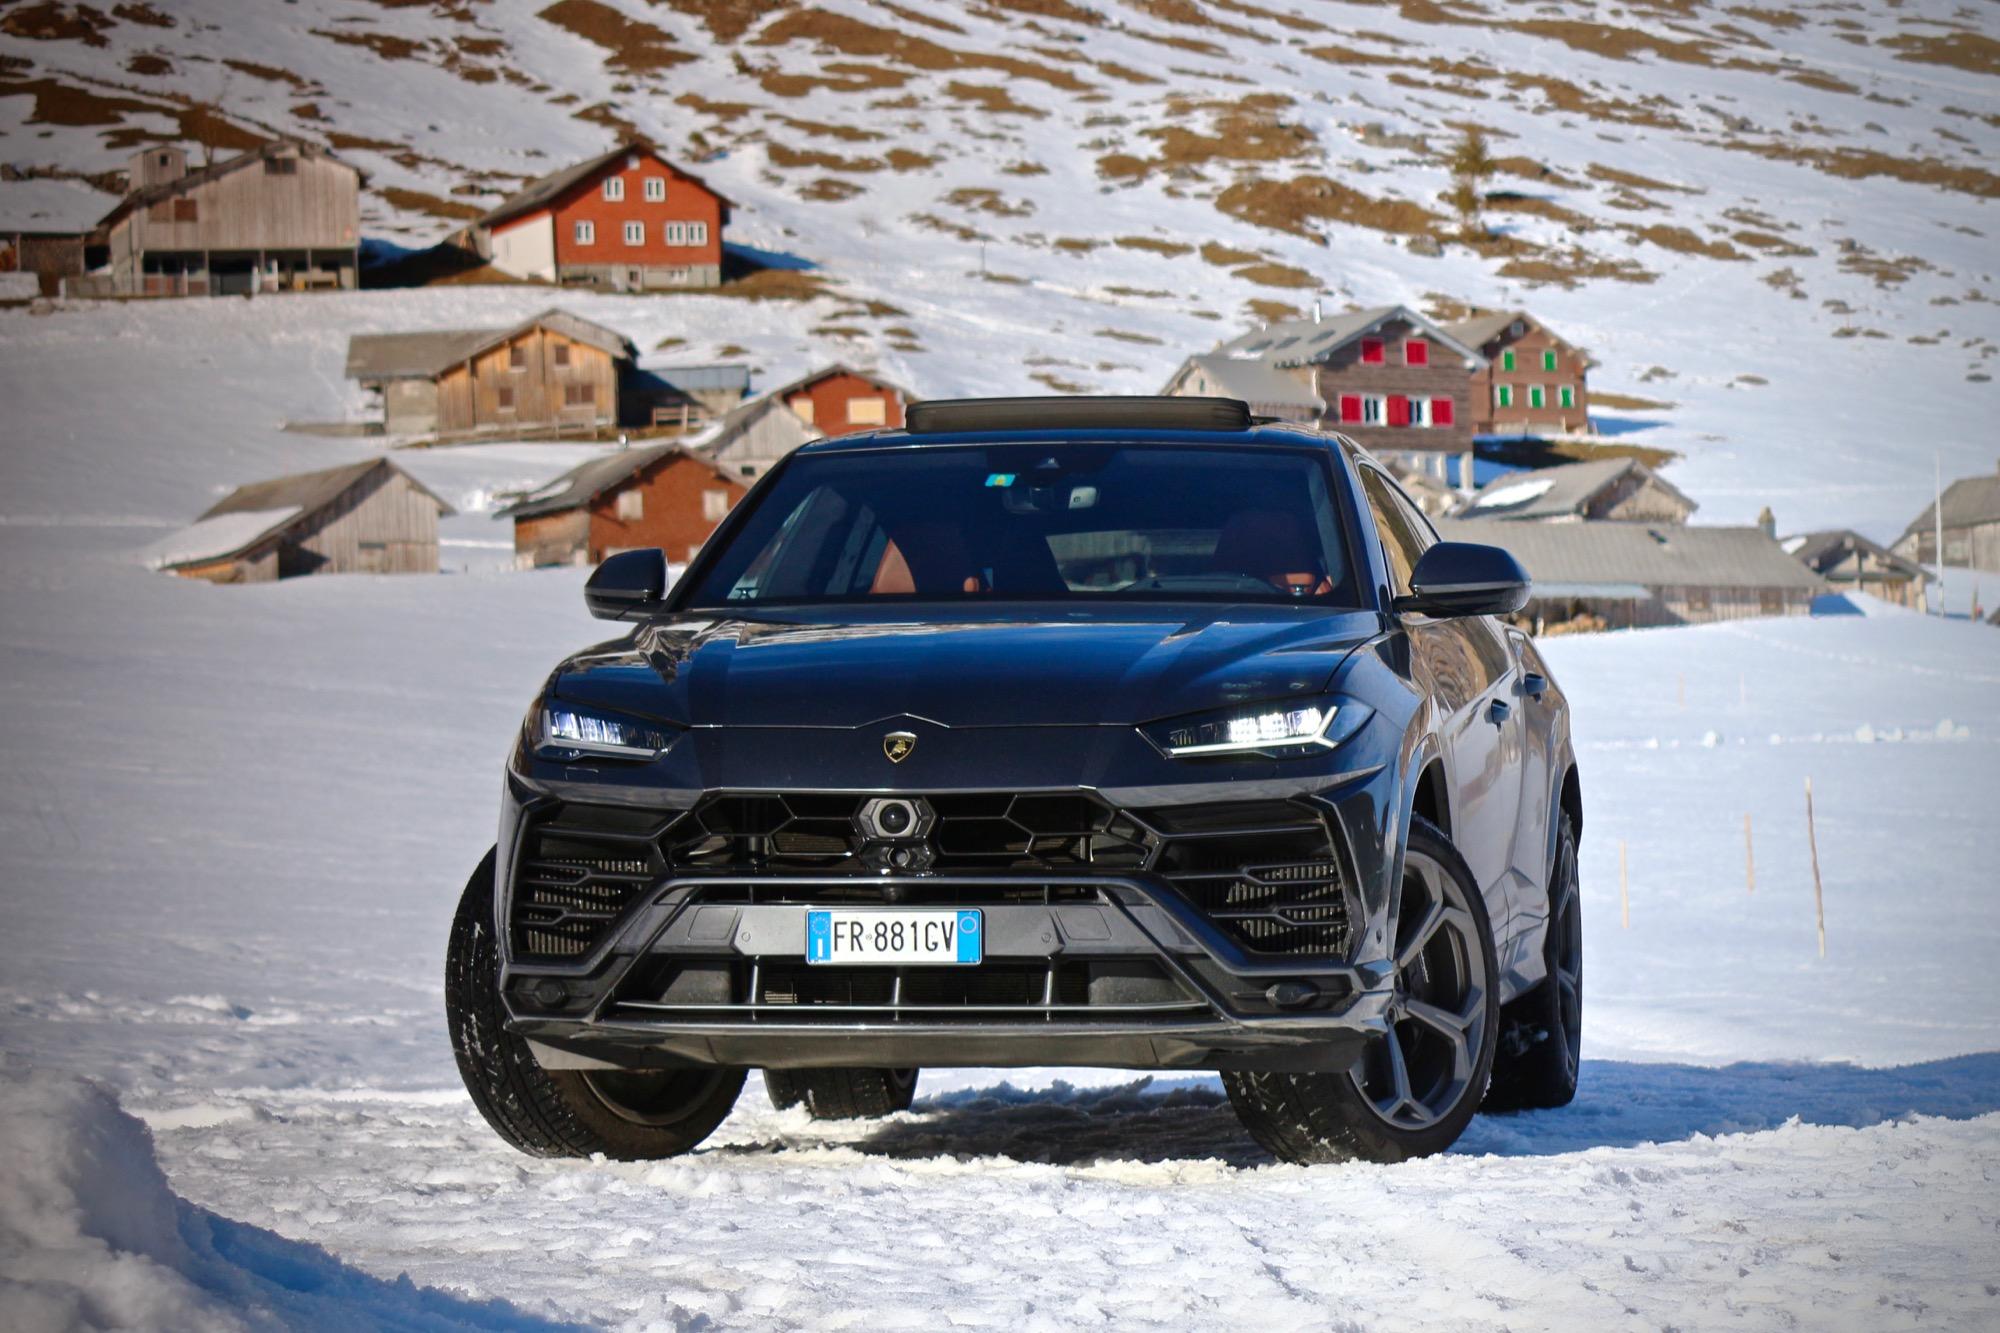 Lamborghini Urus: Entdecke das Tier (in dir)